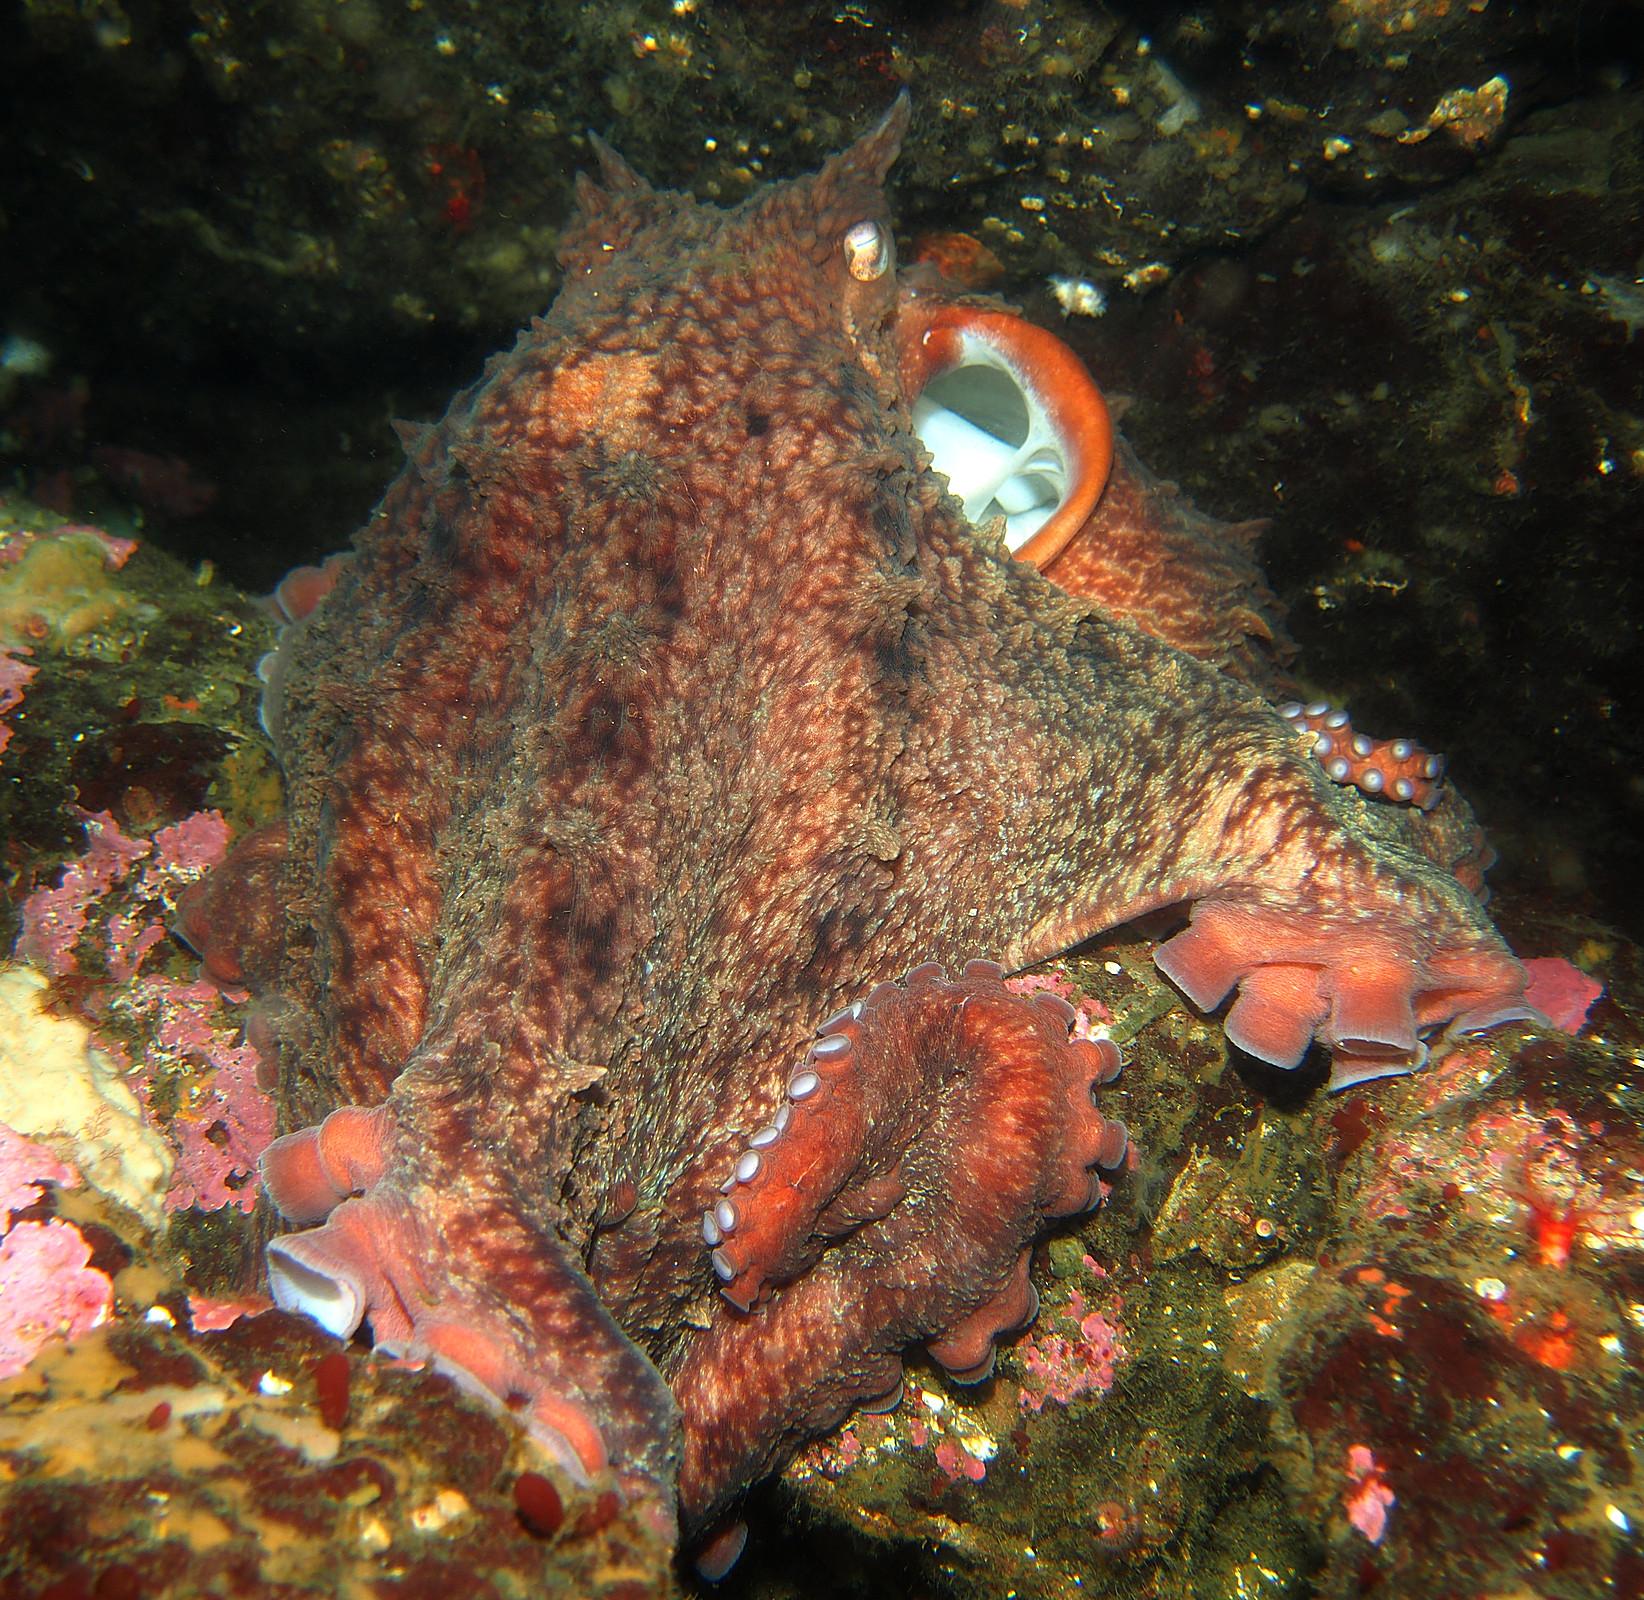 Giant Pacific Octopus underwater